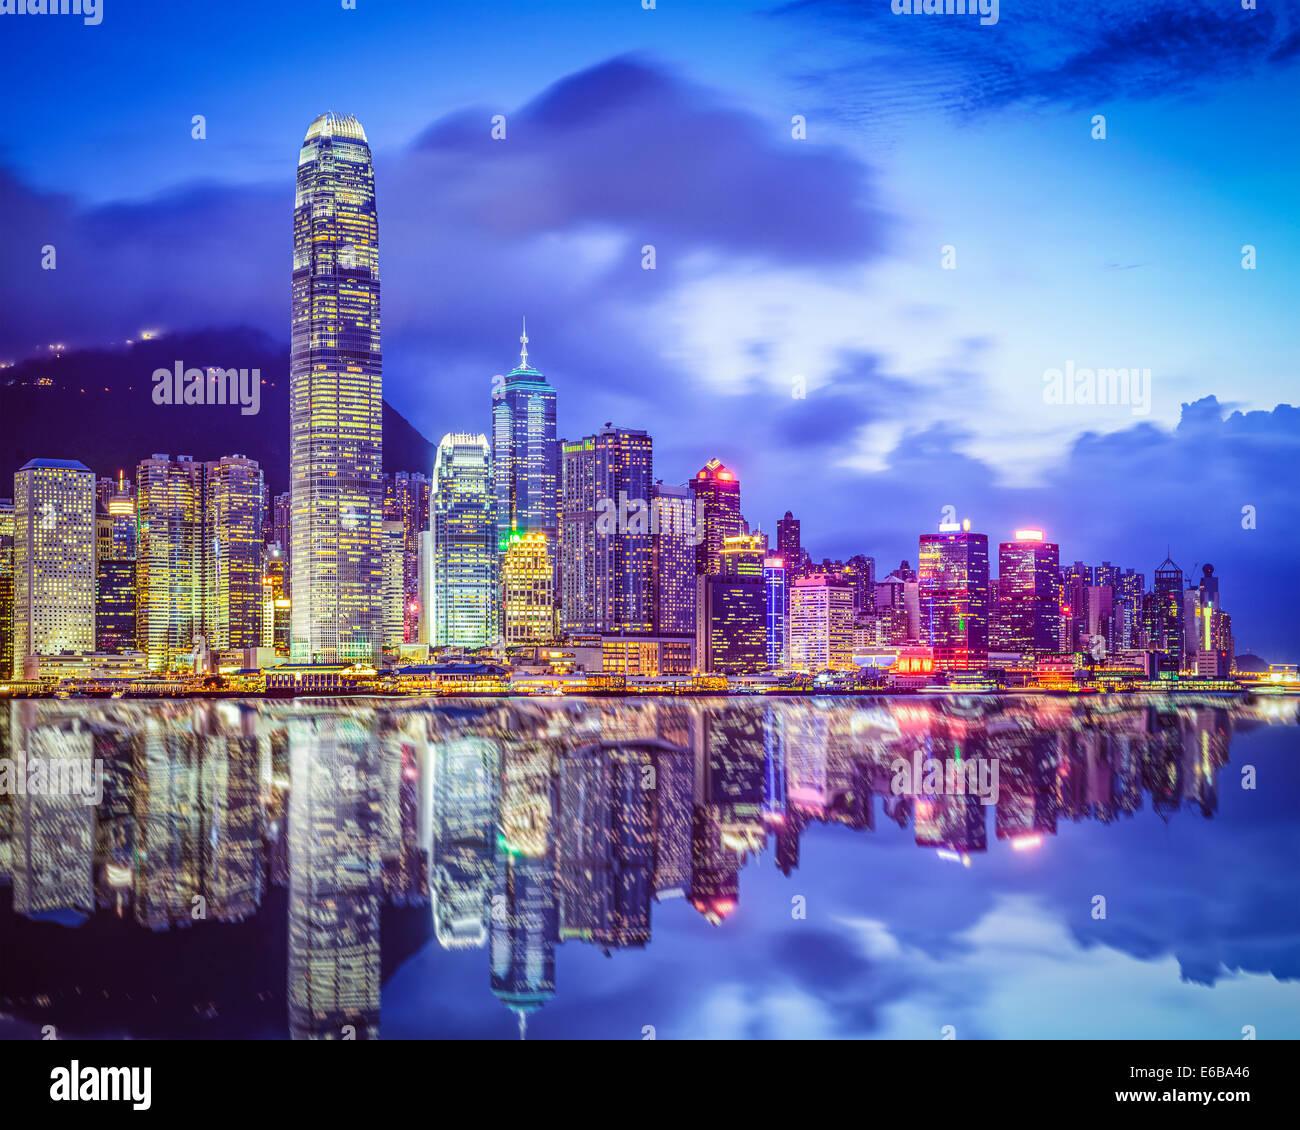 Hong Kong, China city skyline from Victoria Harbor. - Stock Image